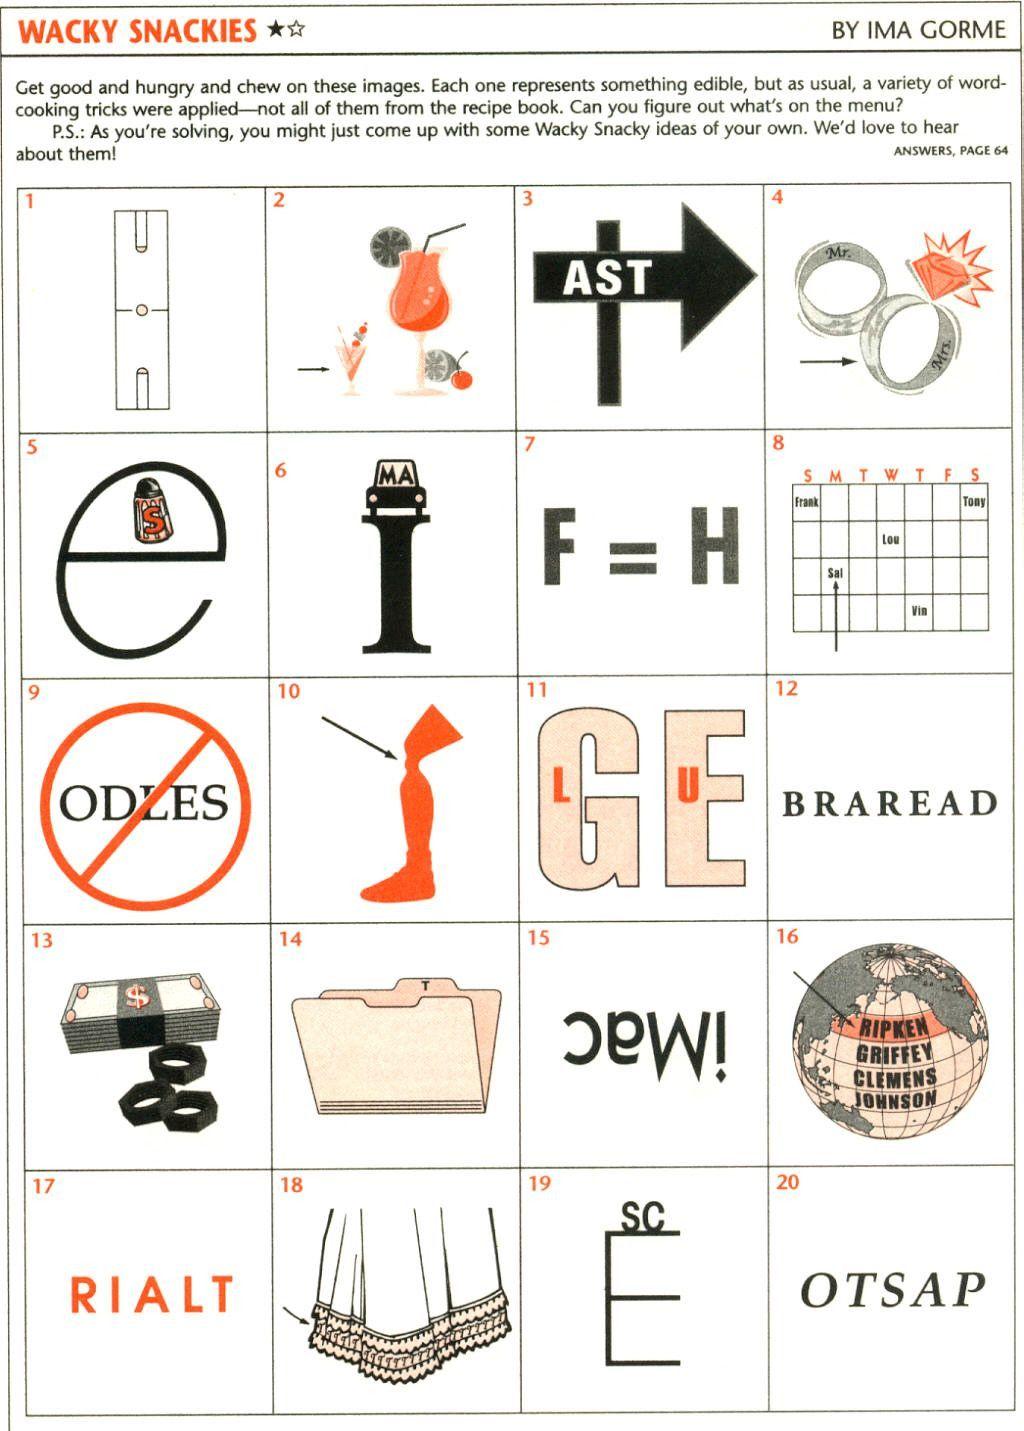 2 Rebus Puzzles Worksheet in 2020 Rebus puzzles, Word